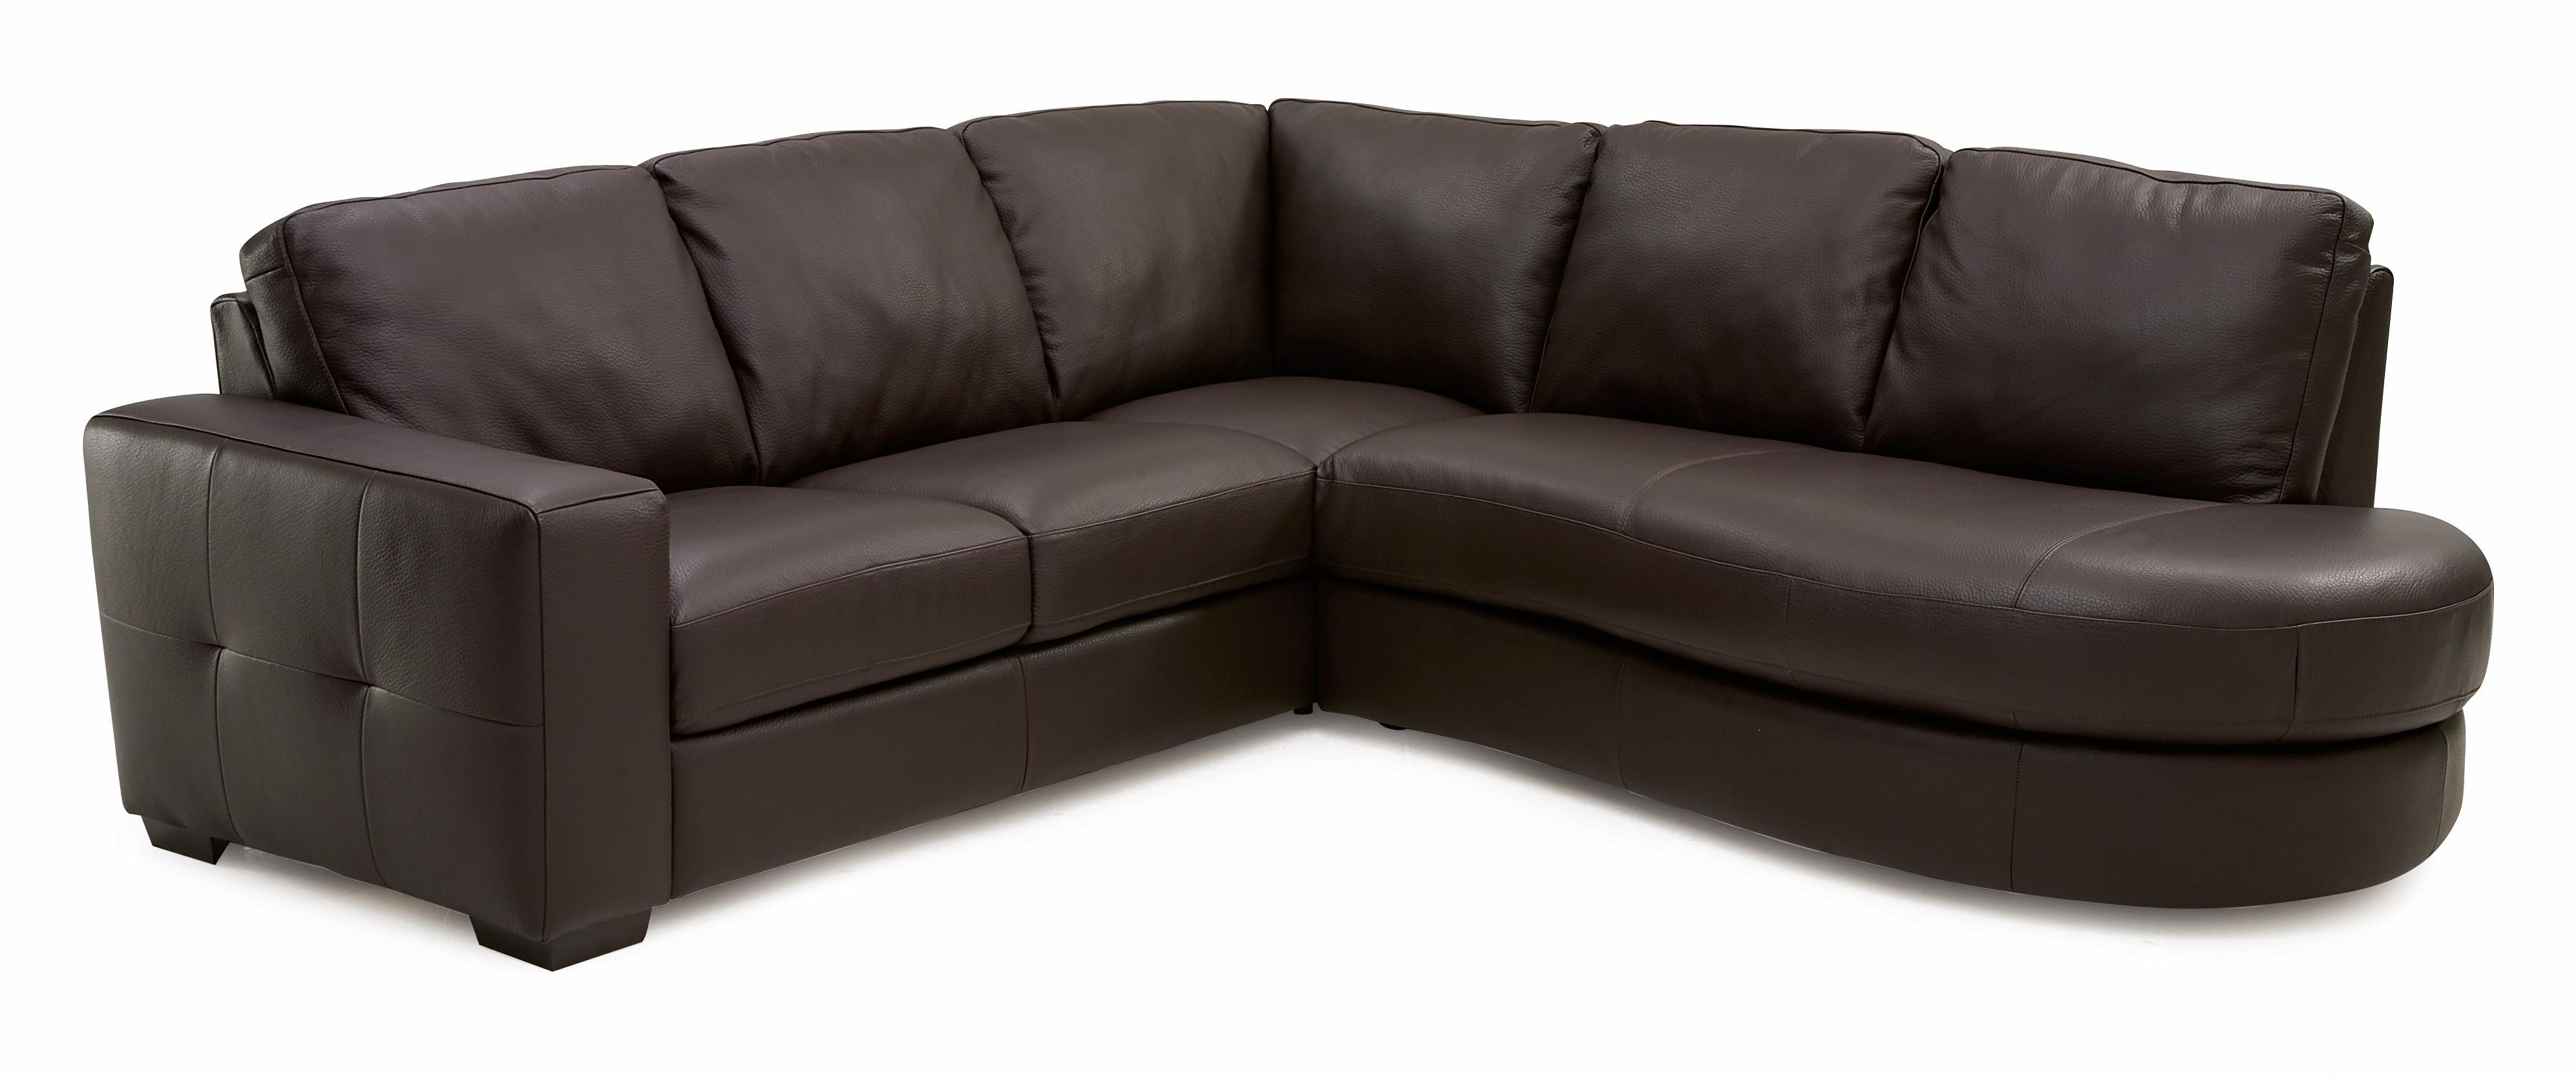 Palliser Push Contemporary Dual Reclining Sectional Sofa AHFA